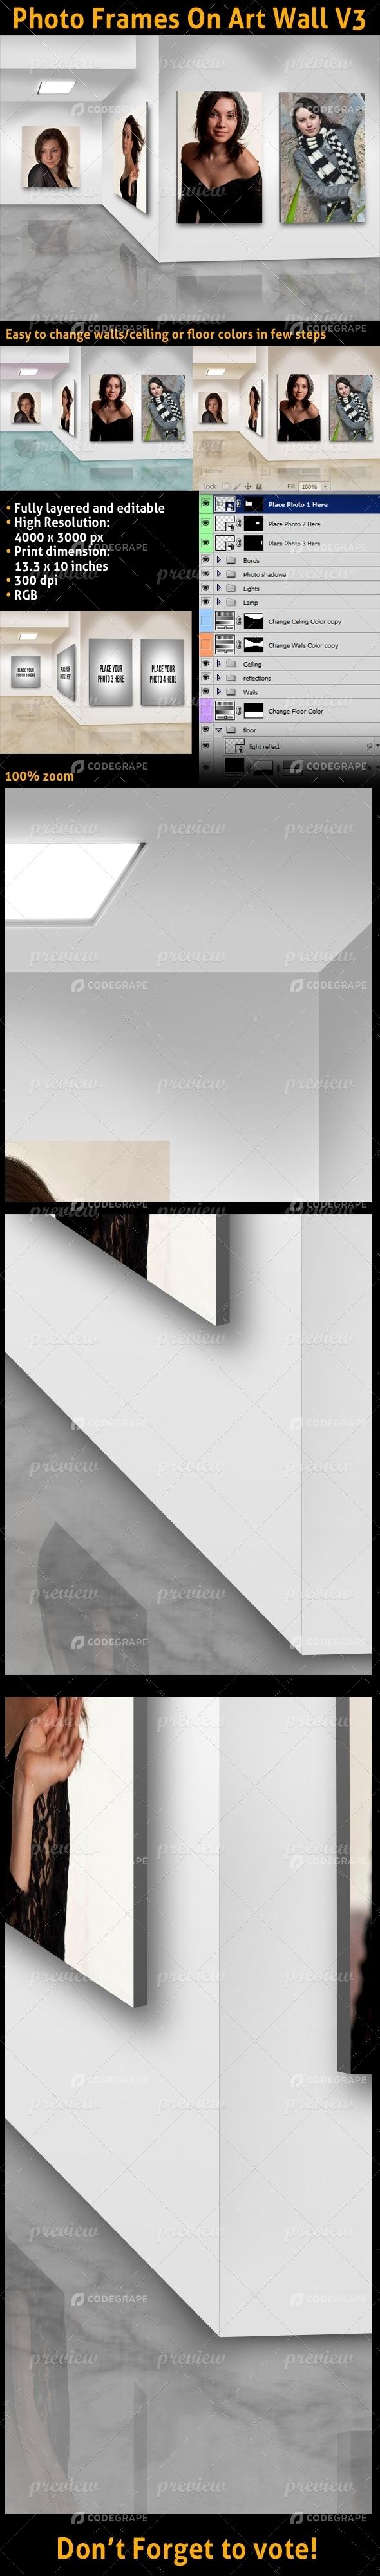 Photo Frames On Art Wall V3